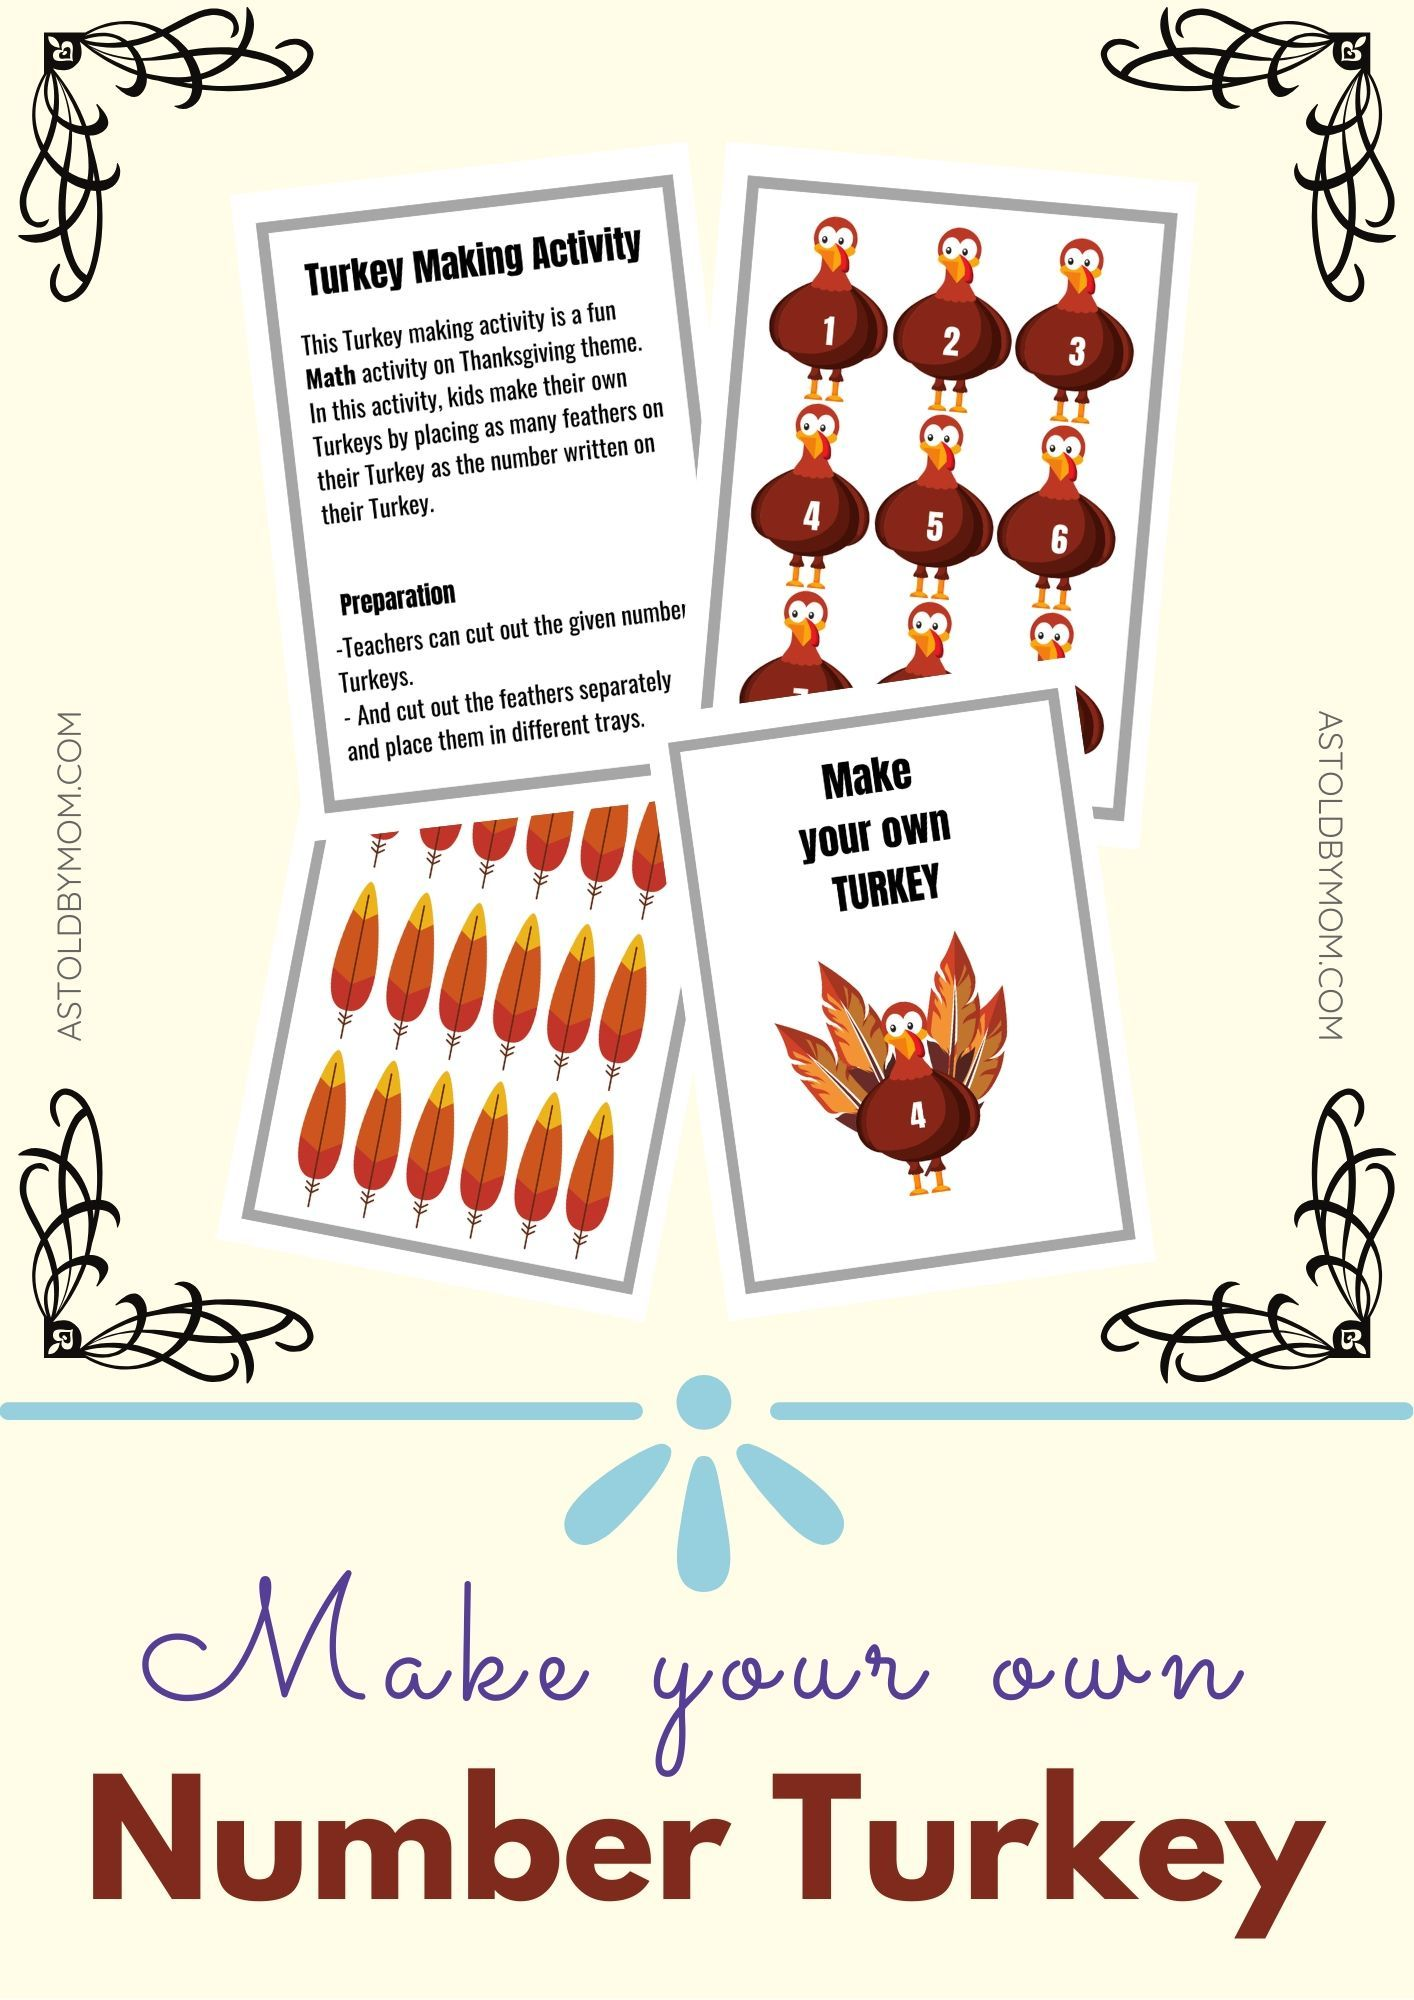 Make A Turkey Preschool To Class 1 Activity